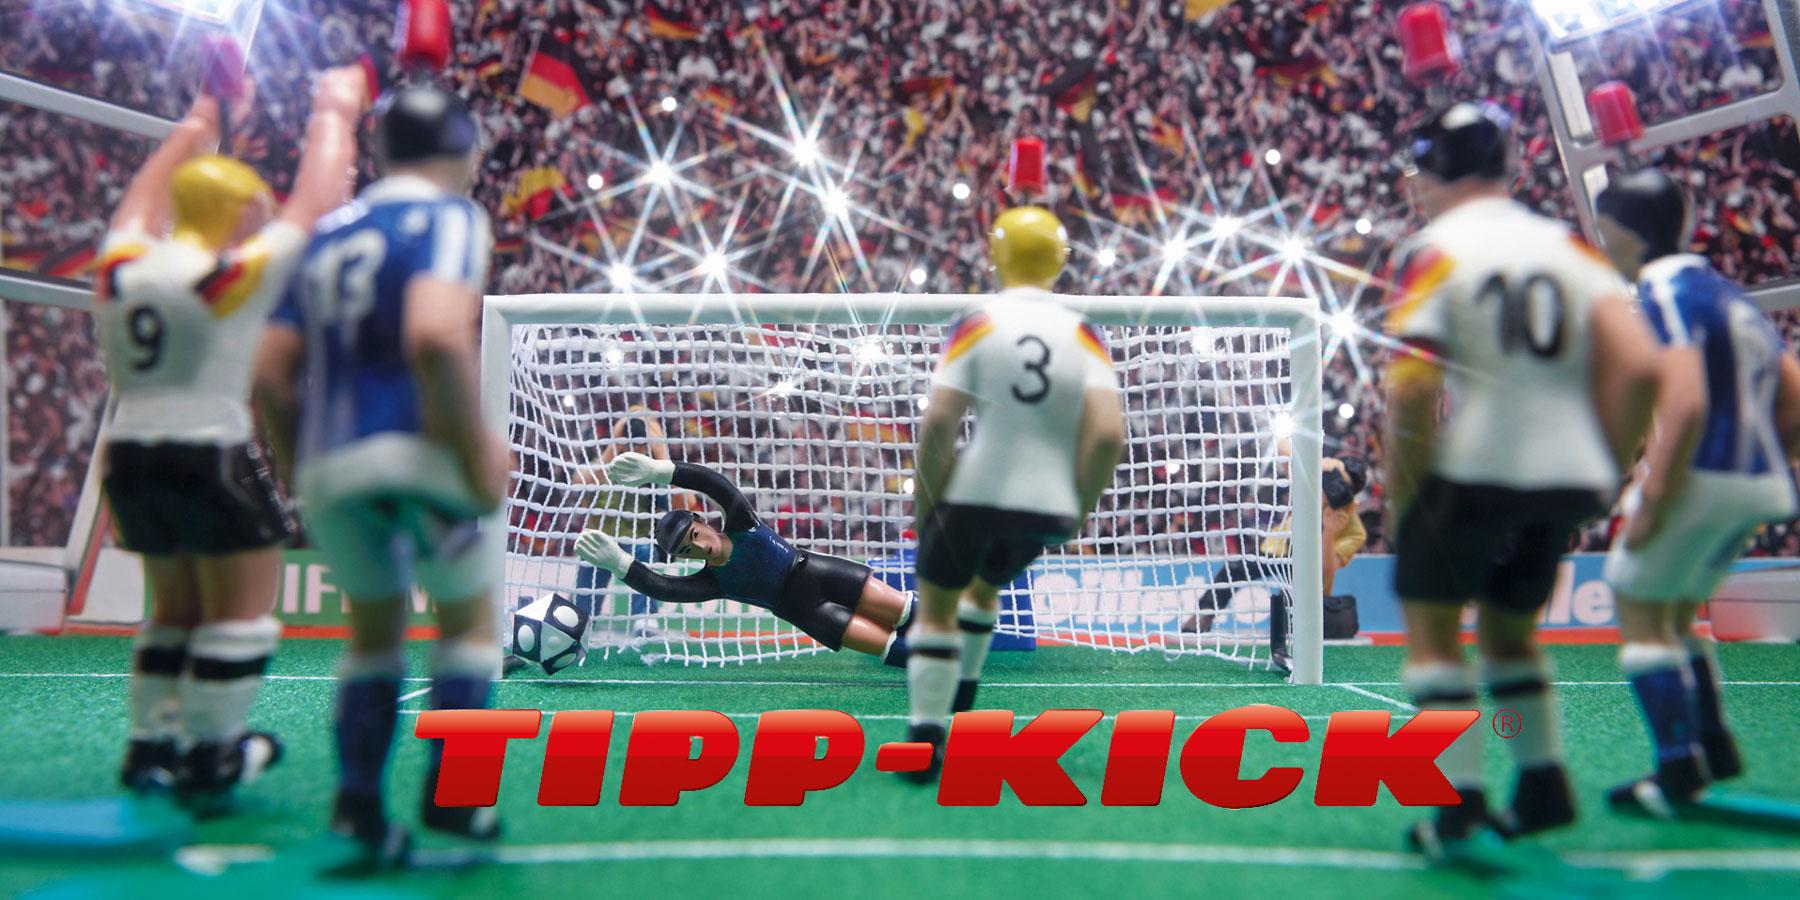 TippKick